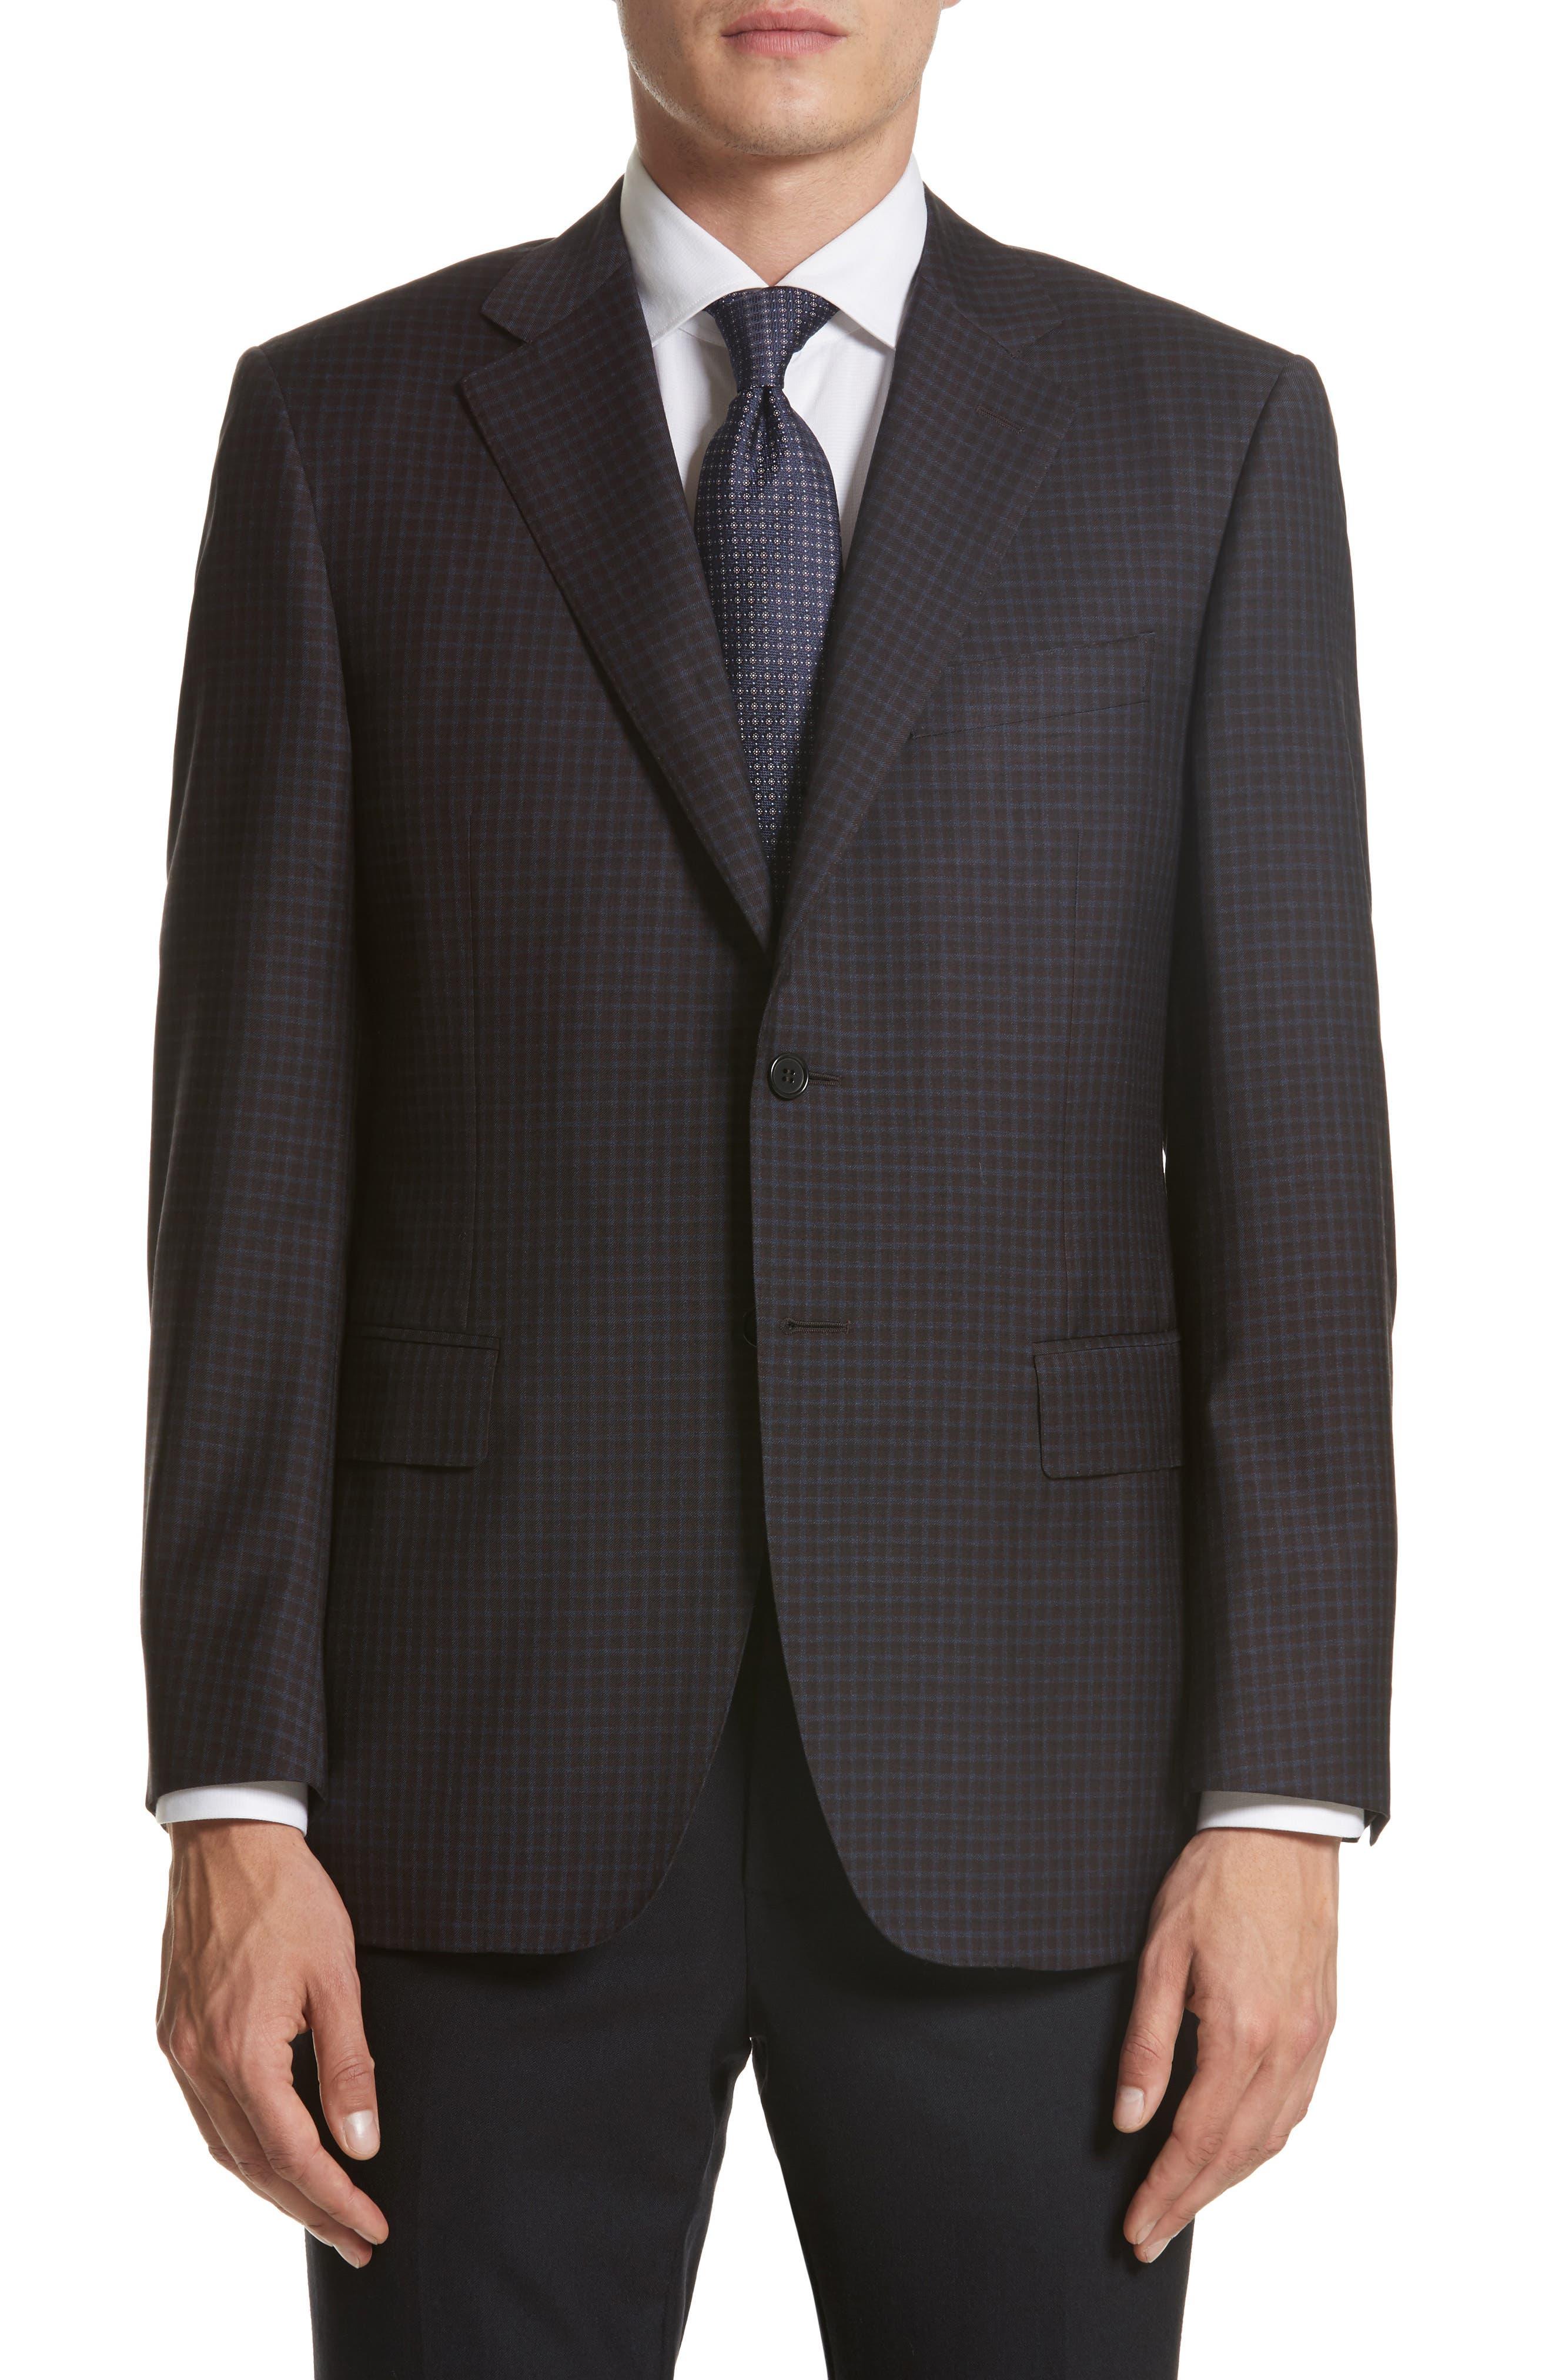 Canali Classic Fit Check Wool Sport Coat (Regular & Big)